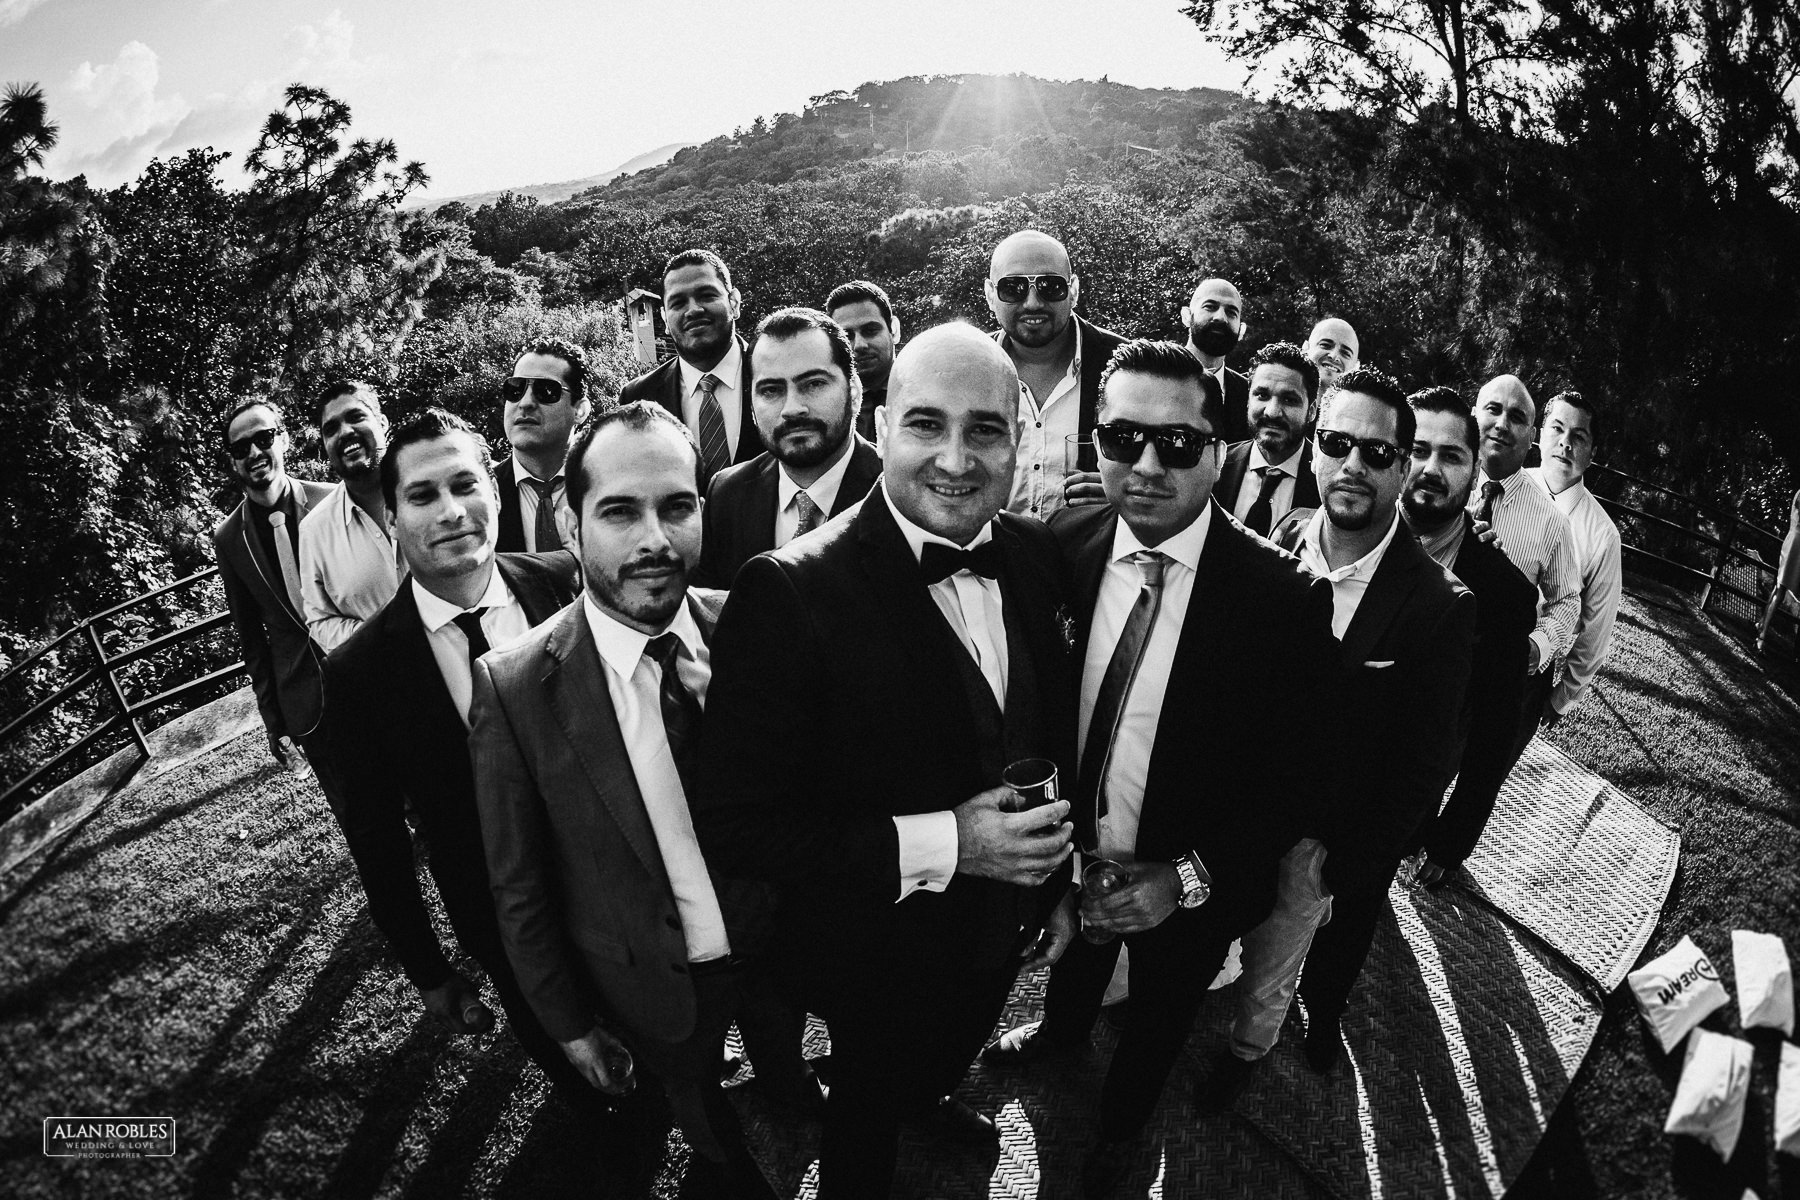 Fotografo de bodas guadalajara Alan Robles - Pinare terraza bistro 52